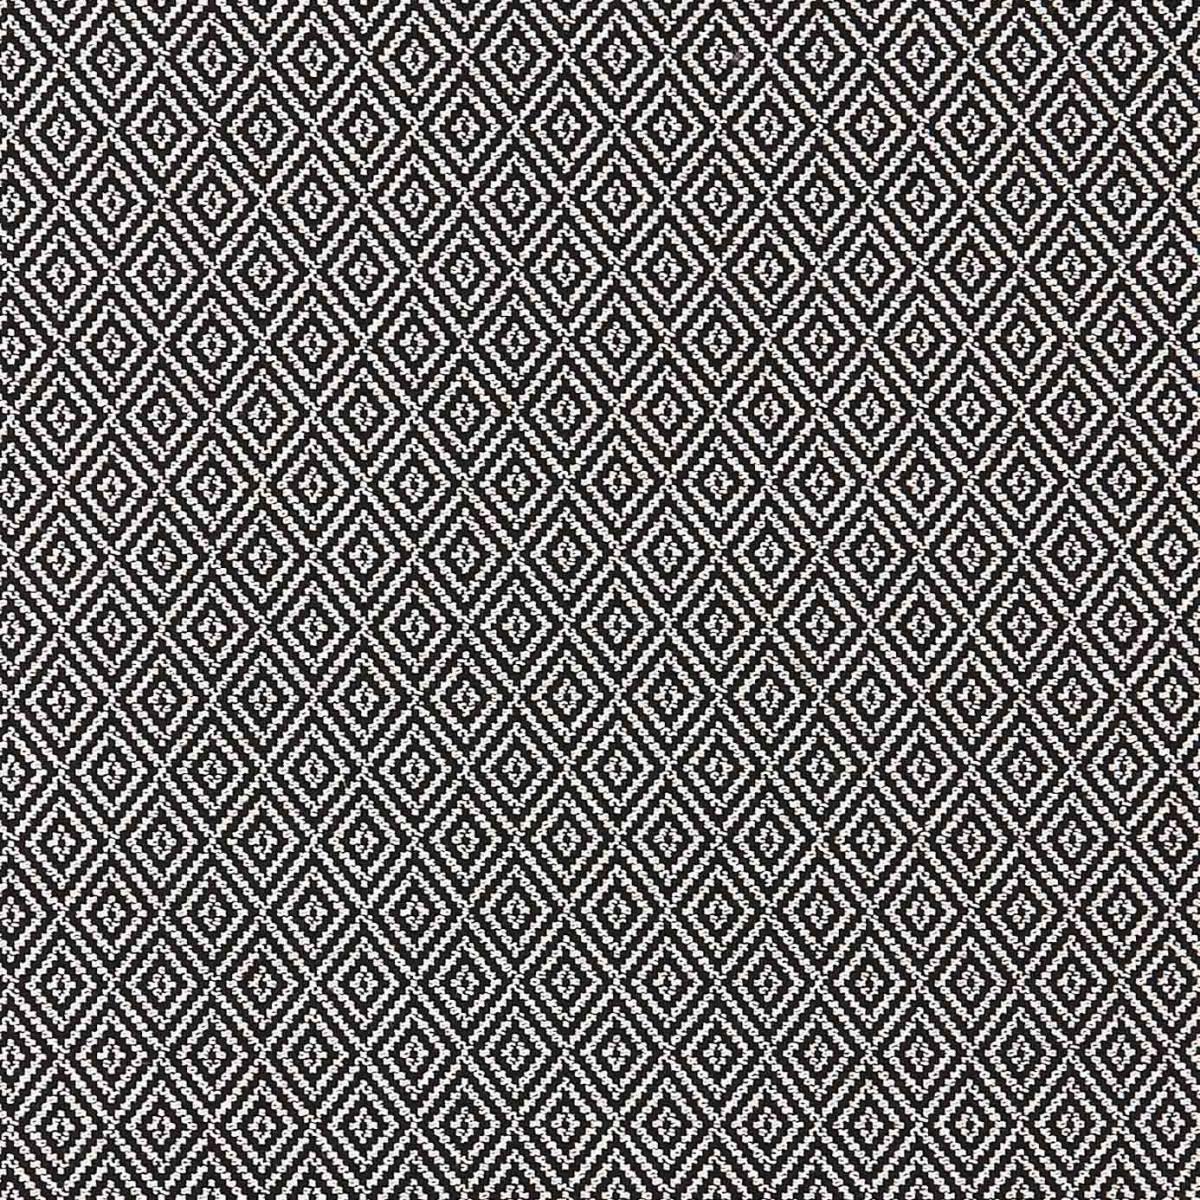 Bw1025 Fabric Black White F0898 01 Clarke Amp Clarke